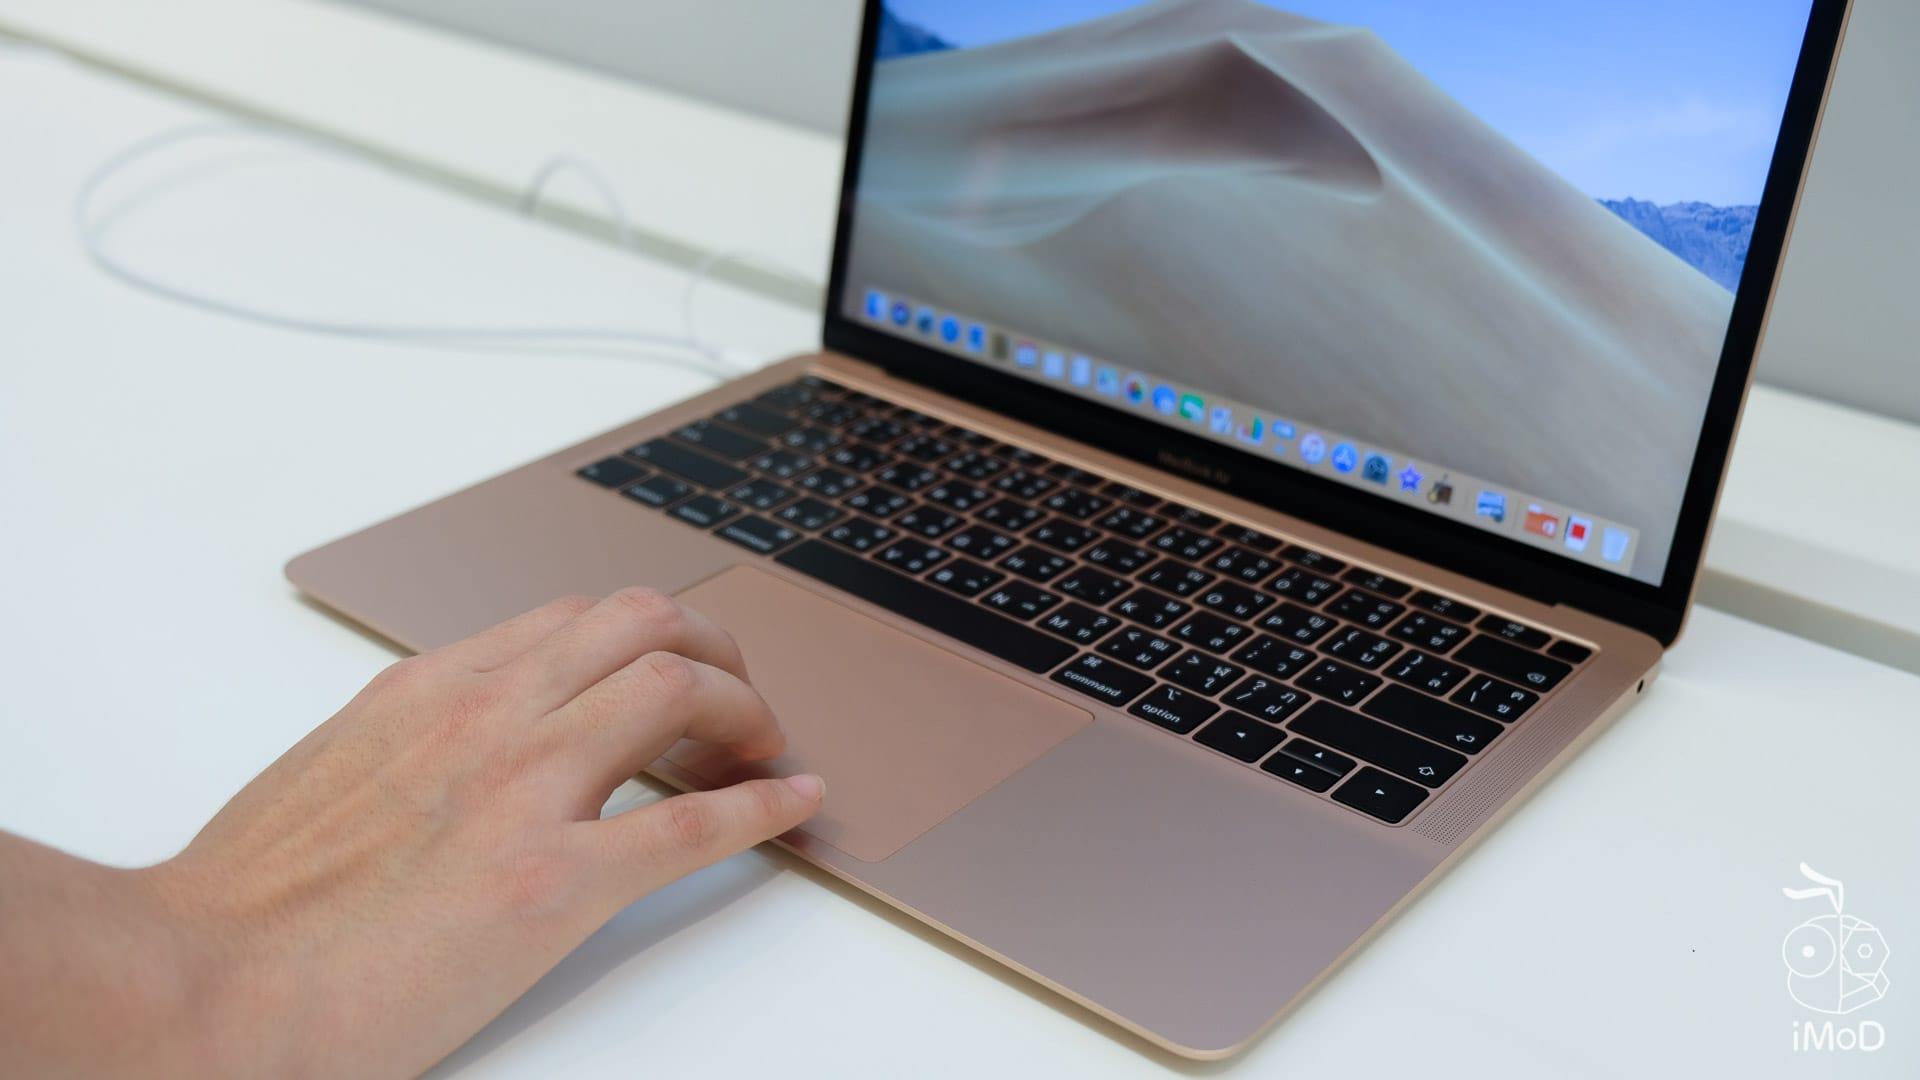 Ipad Pro Macbook Air 2018 Studio7 2370